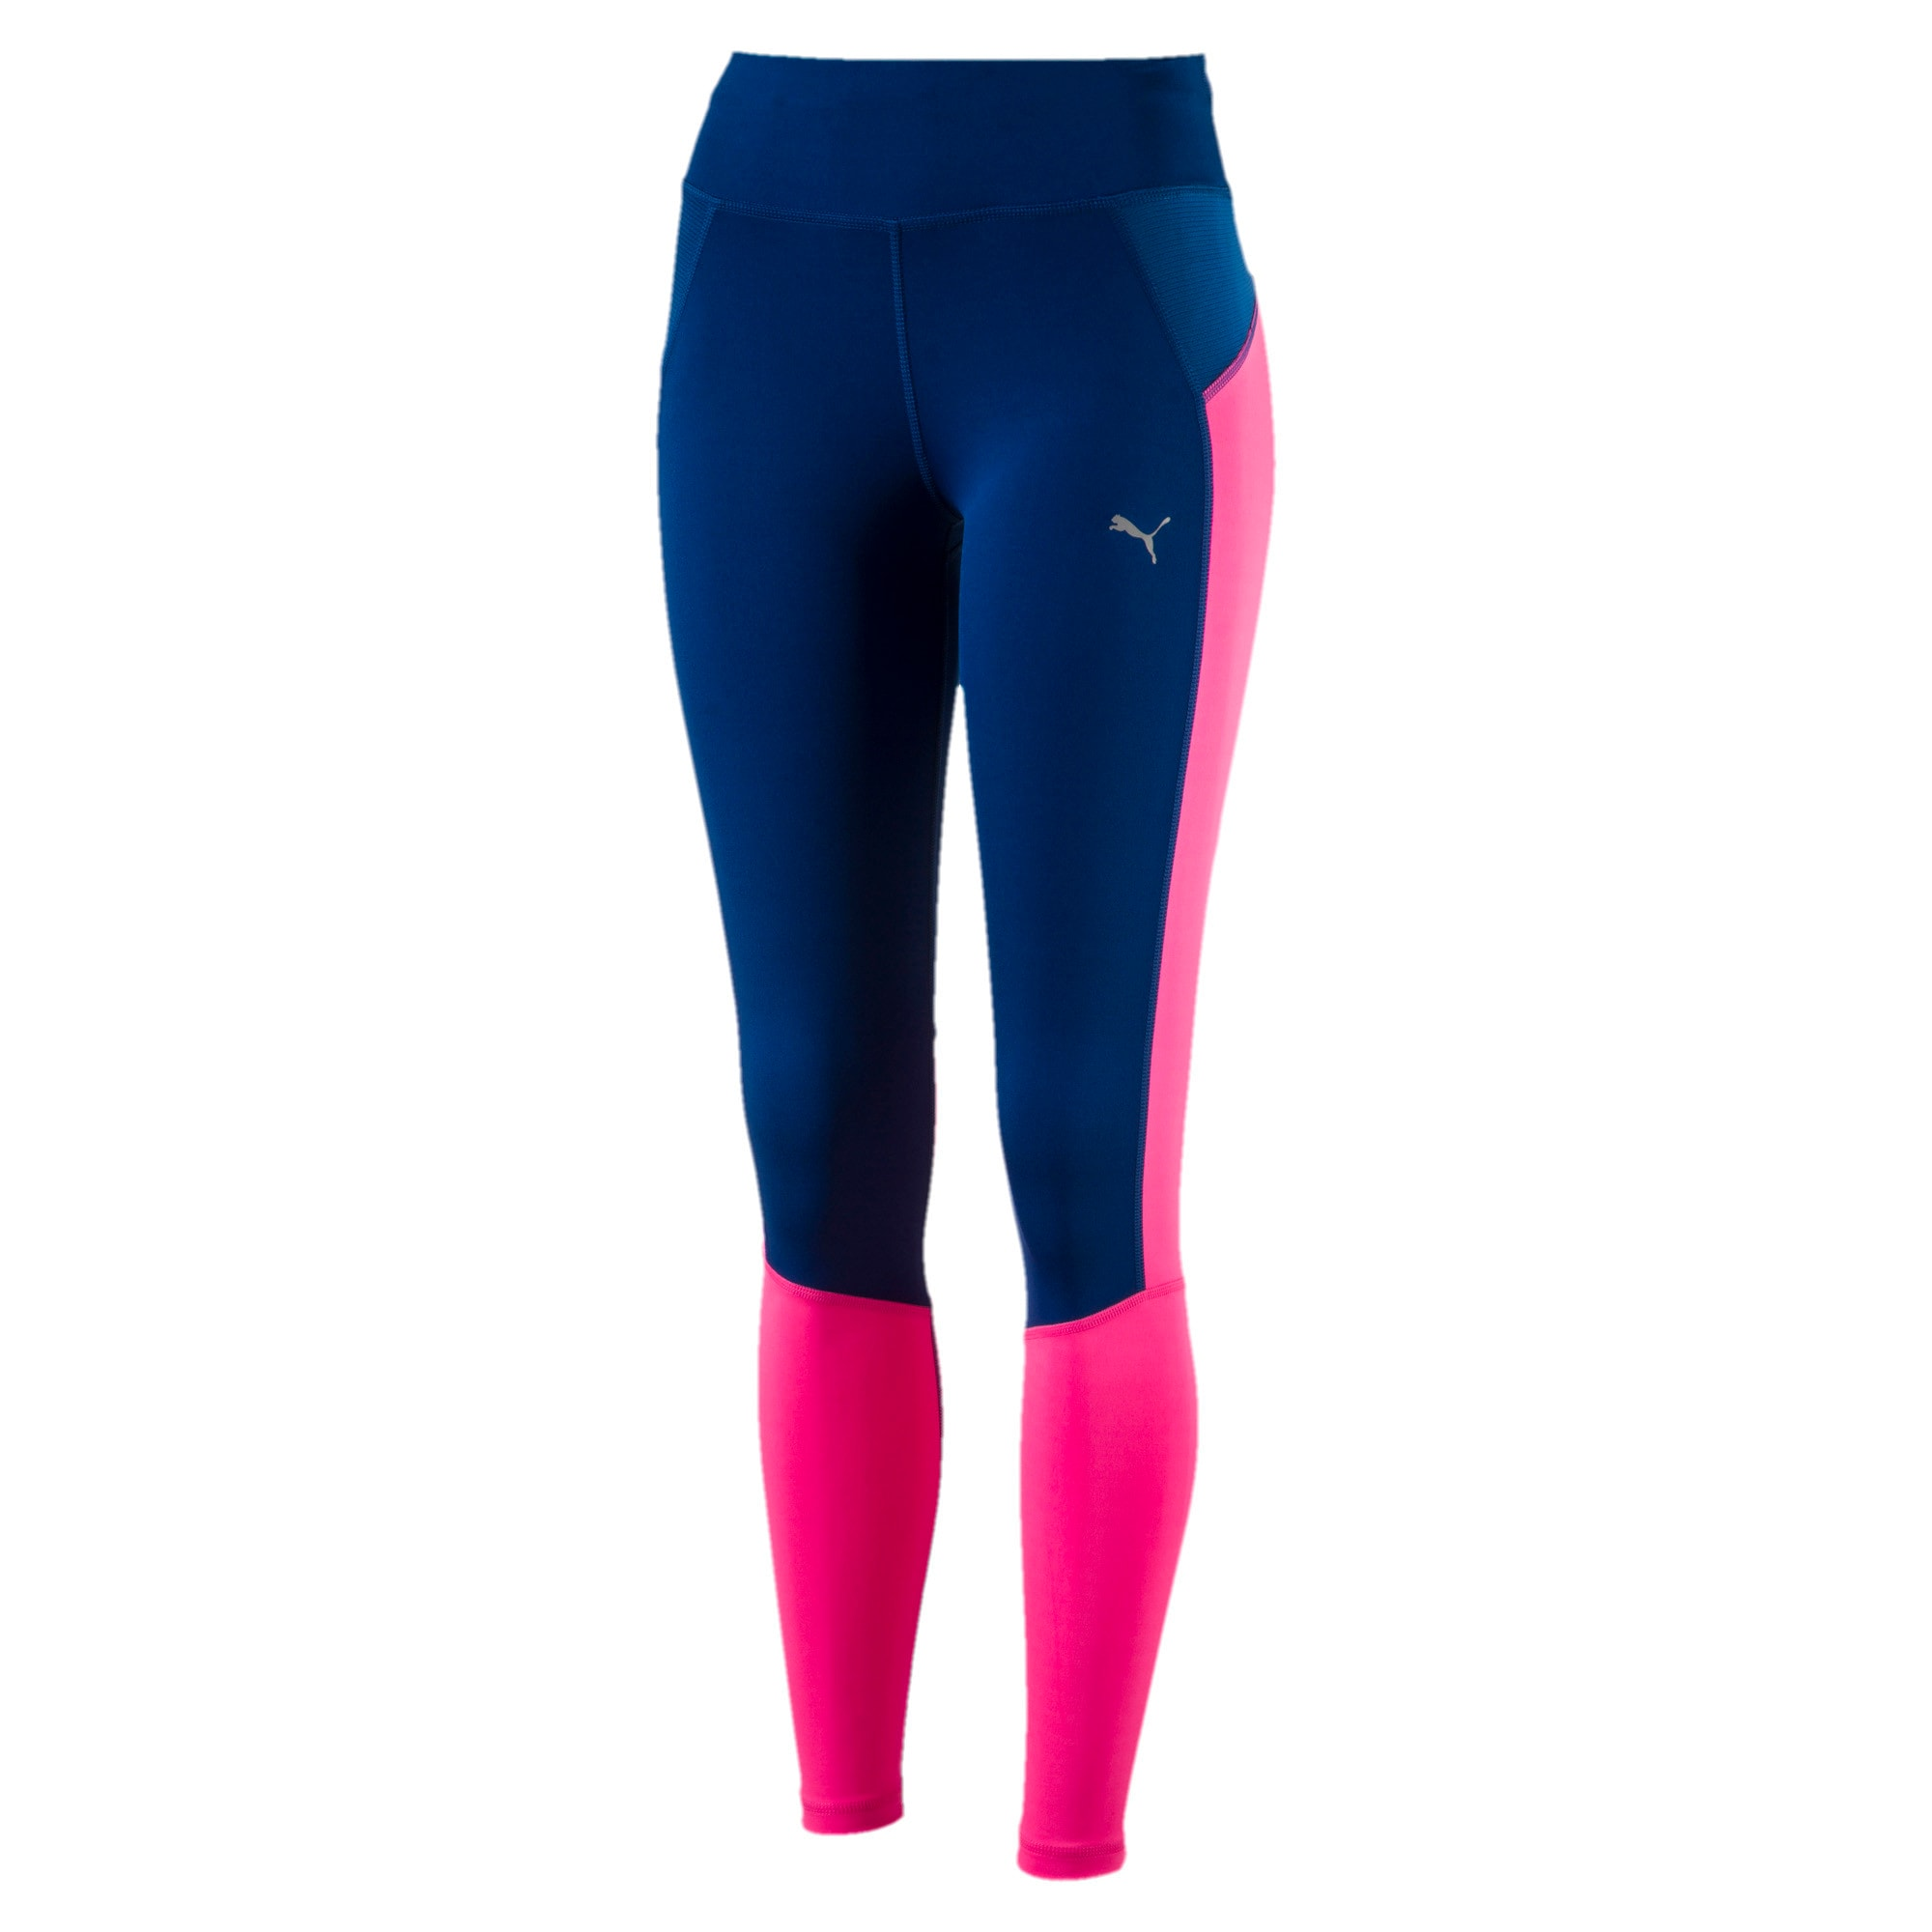 Thumbnail 4 of Running Women's Speed Tights, KNOCKOUT PINK-TRUE BLUE, medium-IND